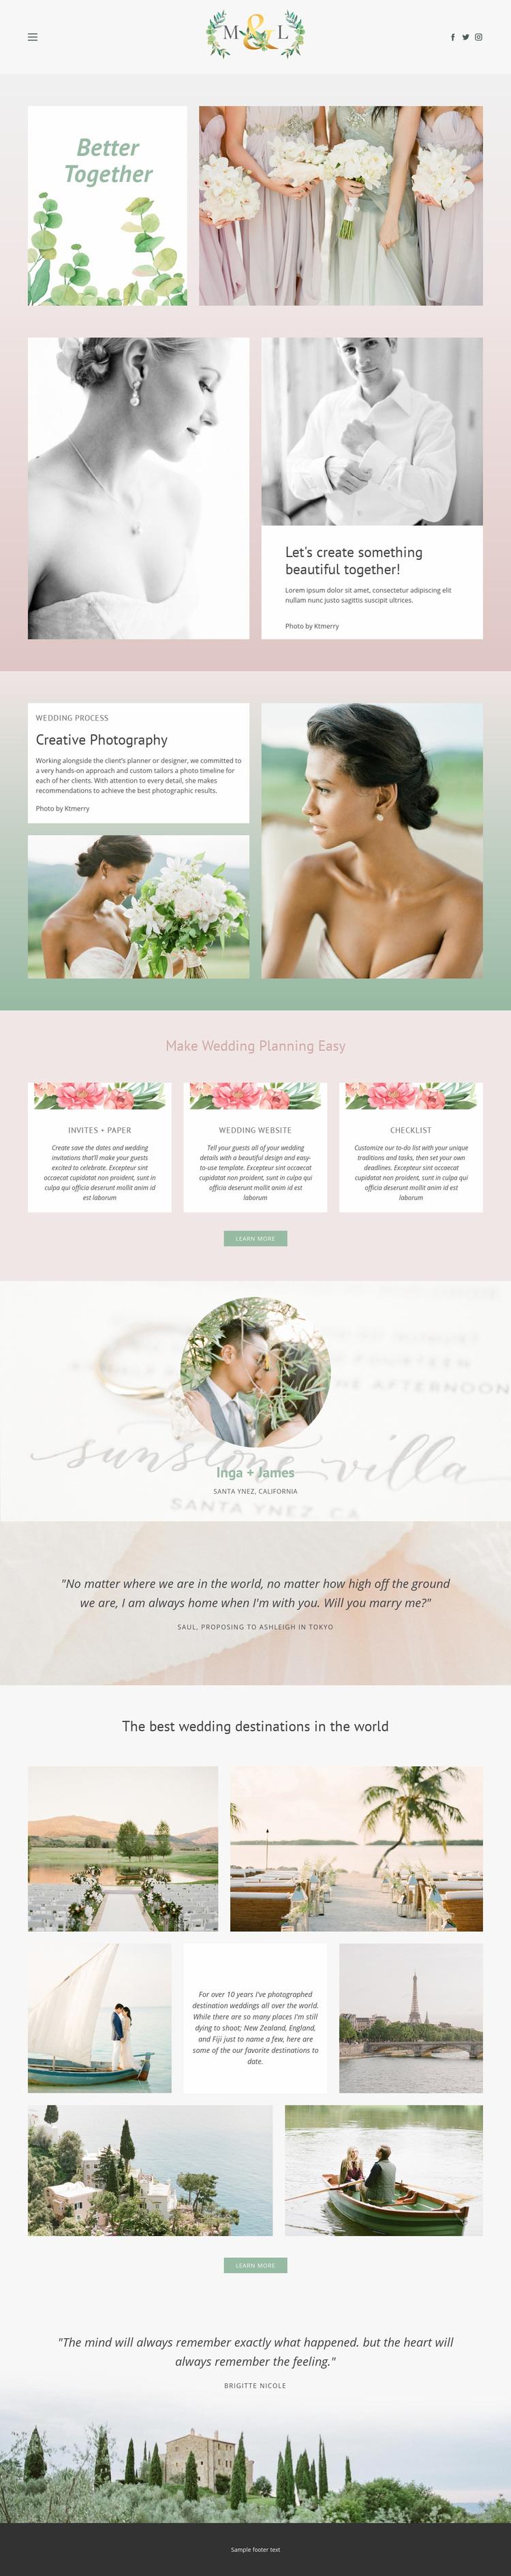 Best photos for wedding Web Page Designer